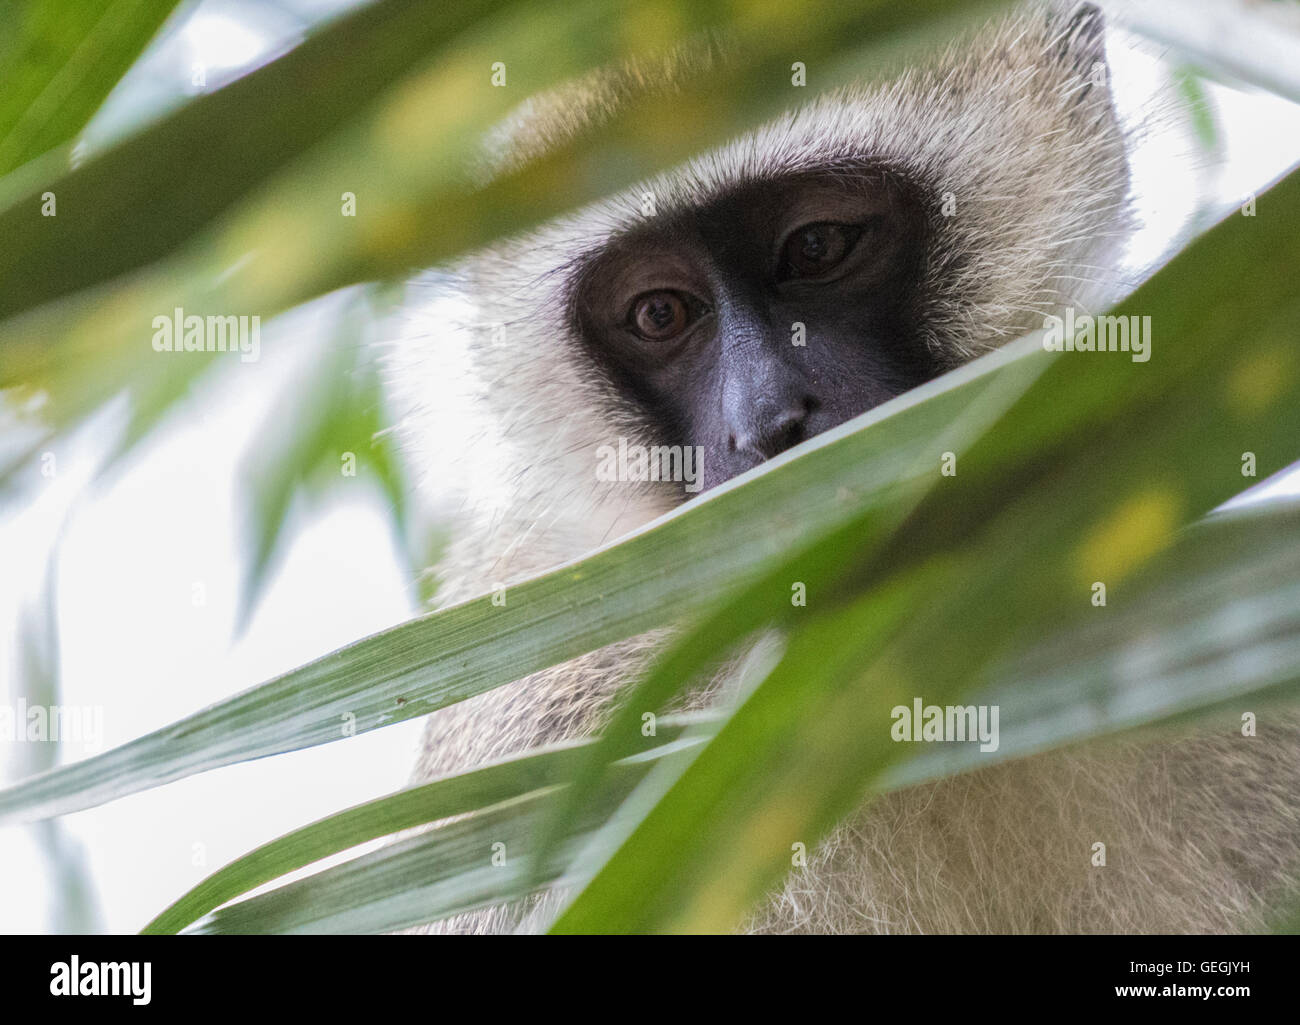 Vervet monkey sitting in a tree and peaking through the leaves, Ukunda, Kenya, Africa - Stock Image